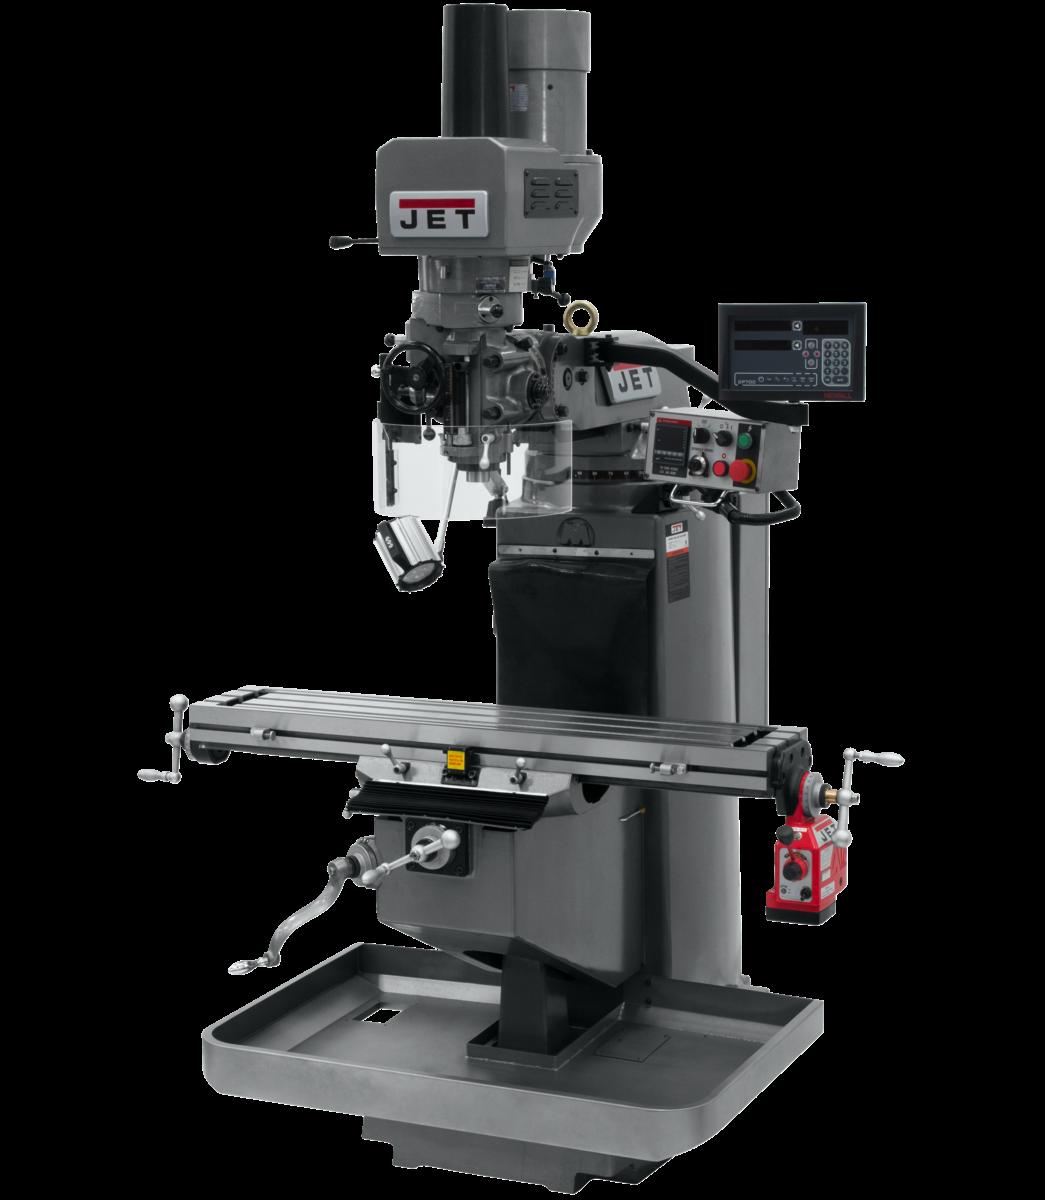 JTM-949EVS with Newall DP700 DRO, X Powerfeed & Air Power Drawbar